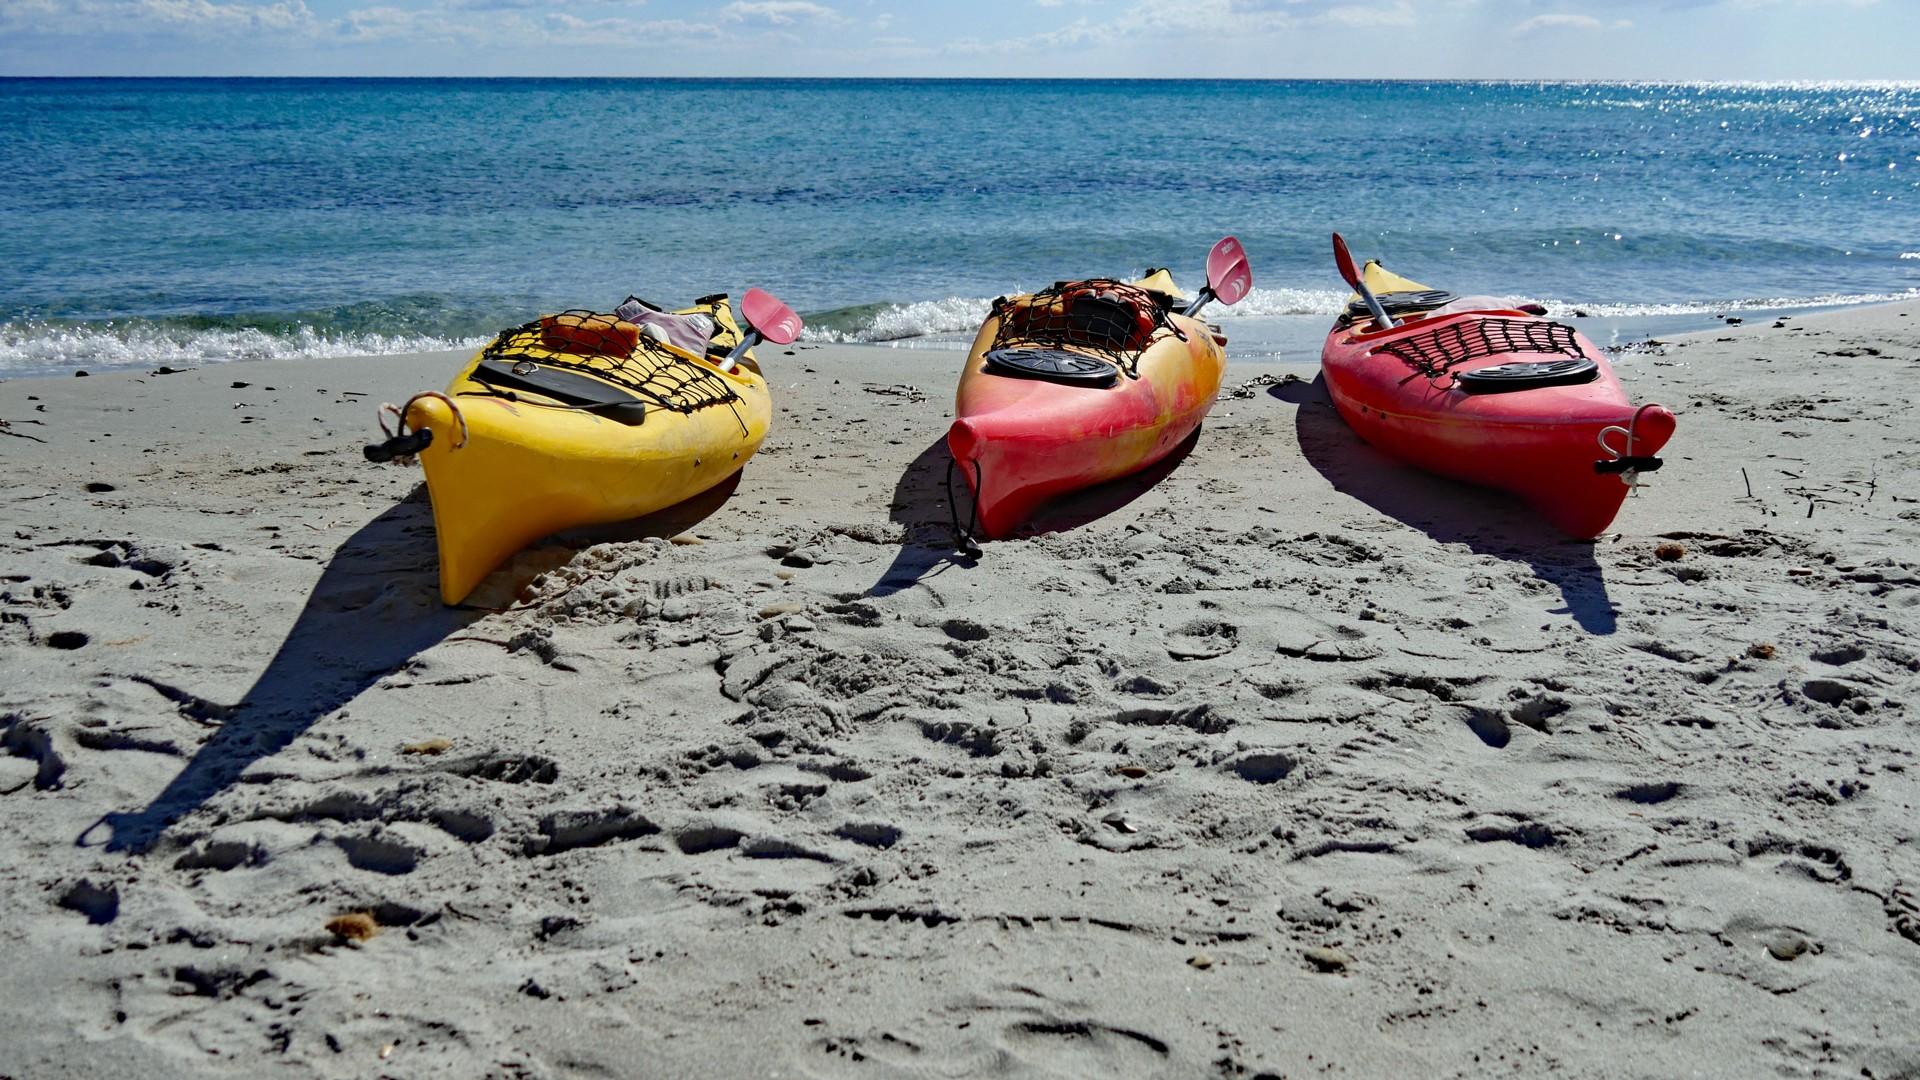 Spiaggia di Berchida - kayaks on the beach.jpg - Sardinia - Wilderness Blue Sea Kayaking - Kayaking